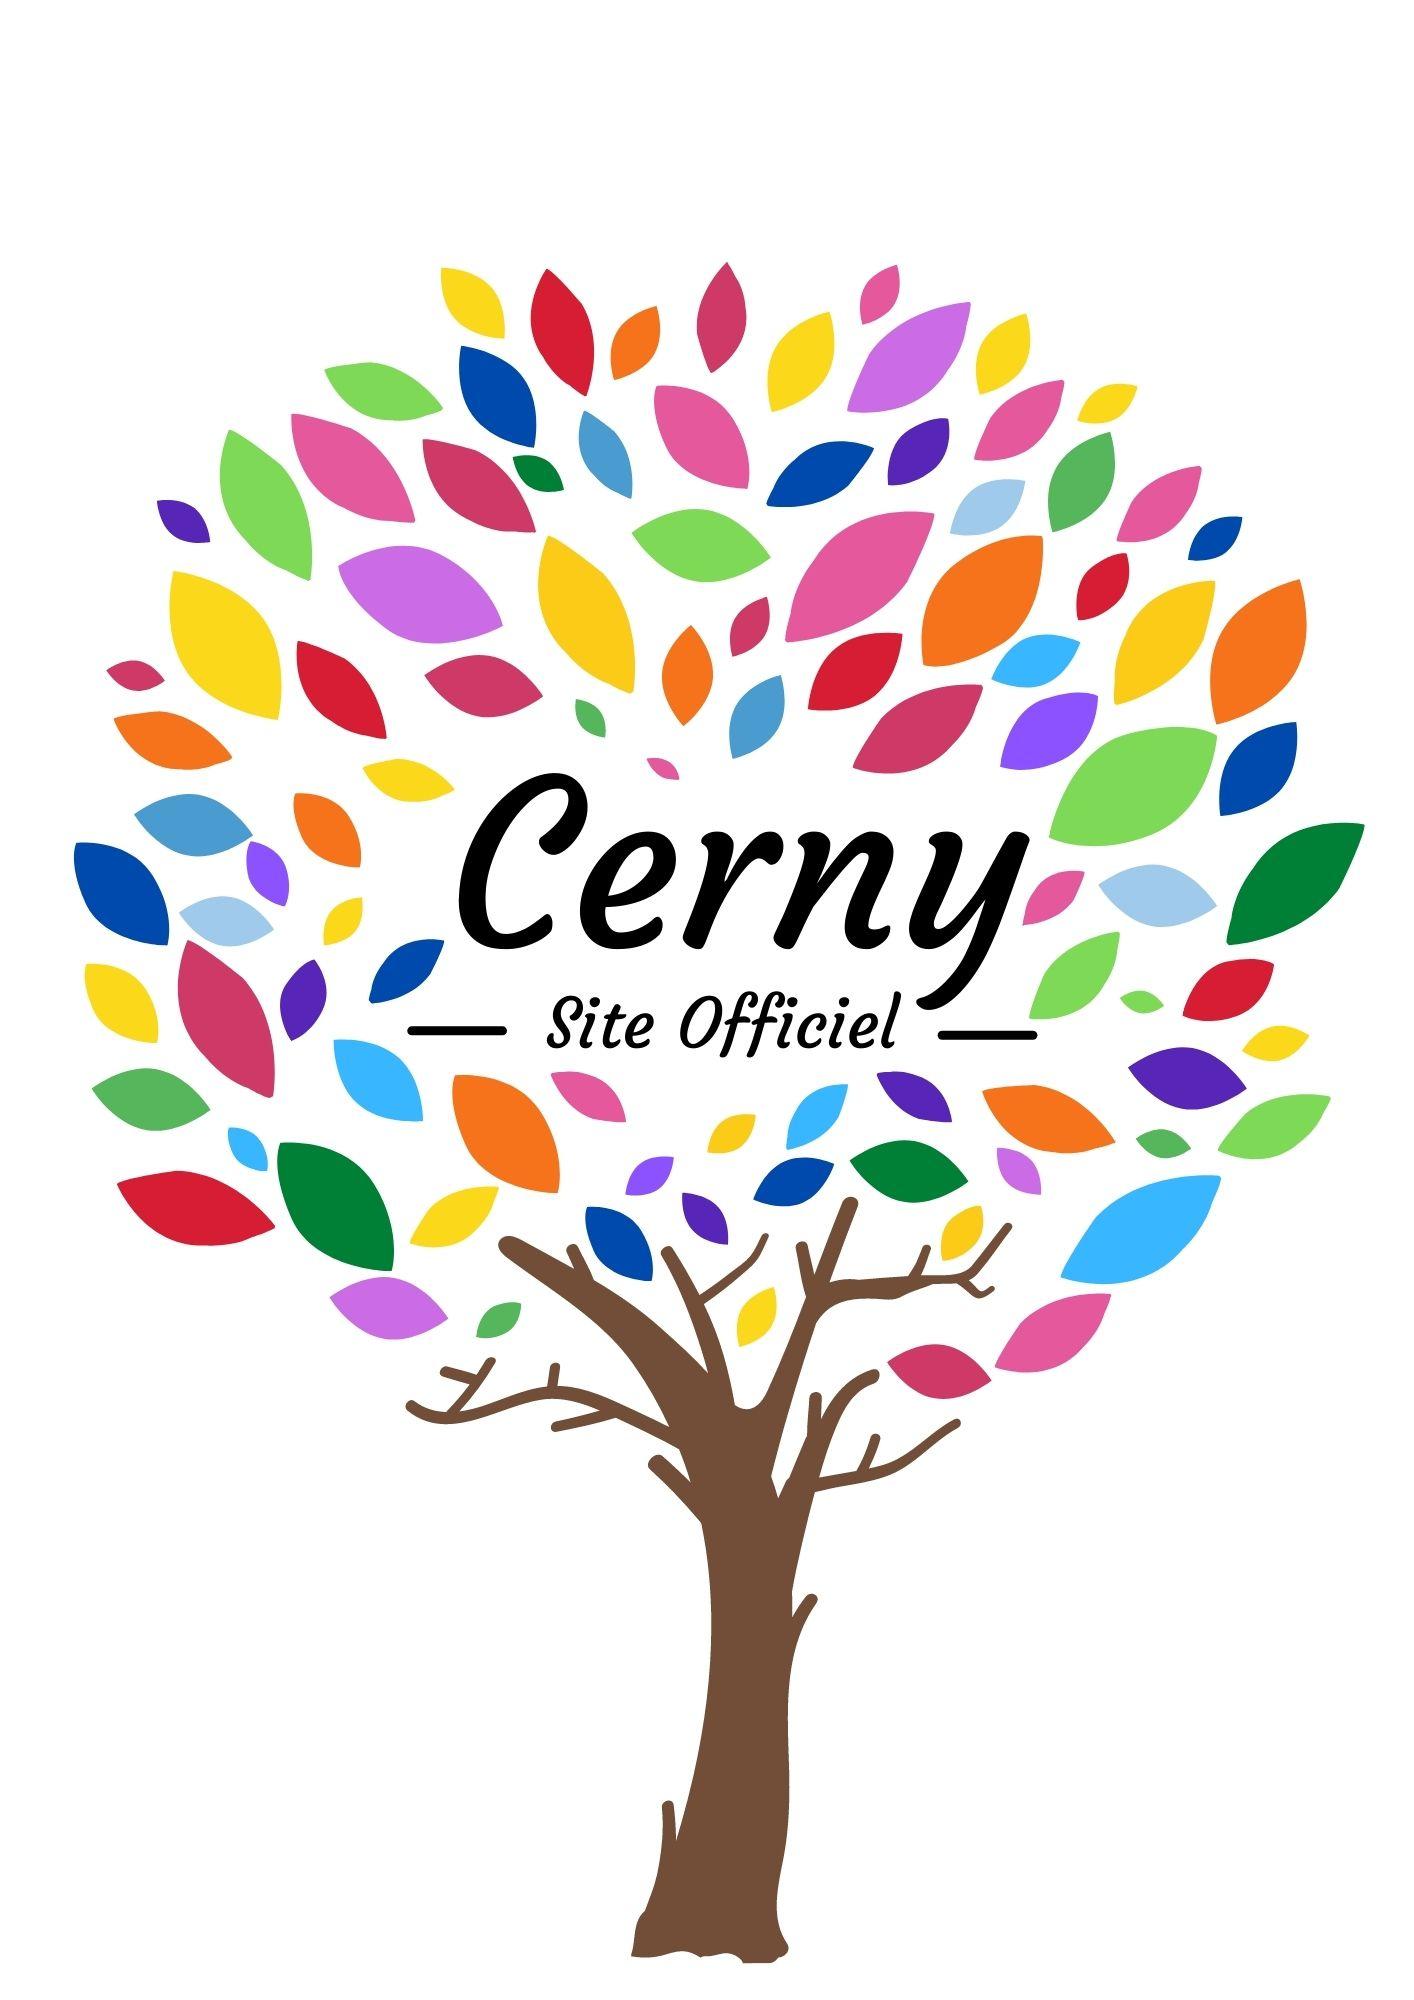 Commune de Cerny